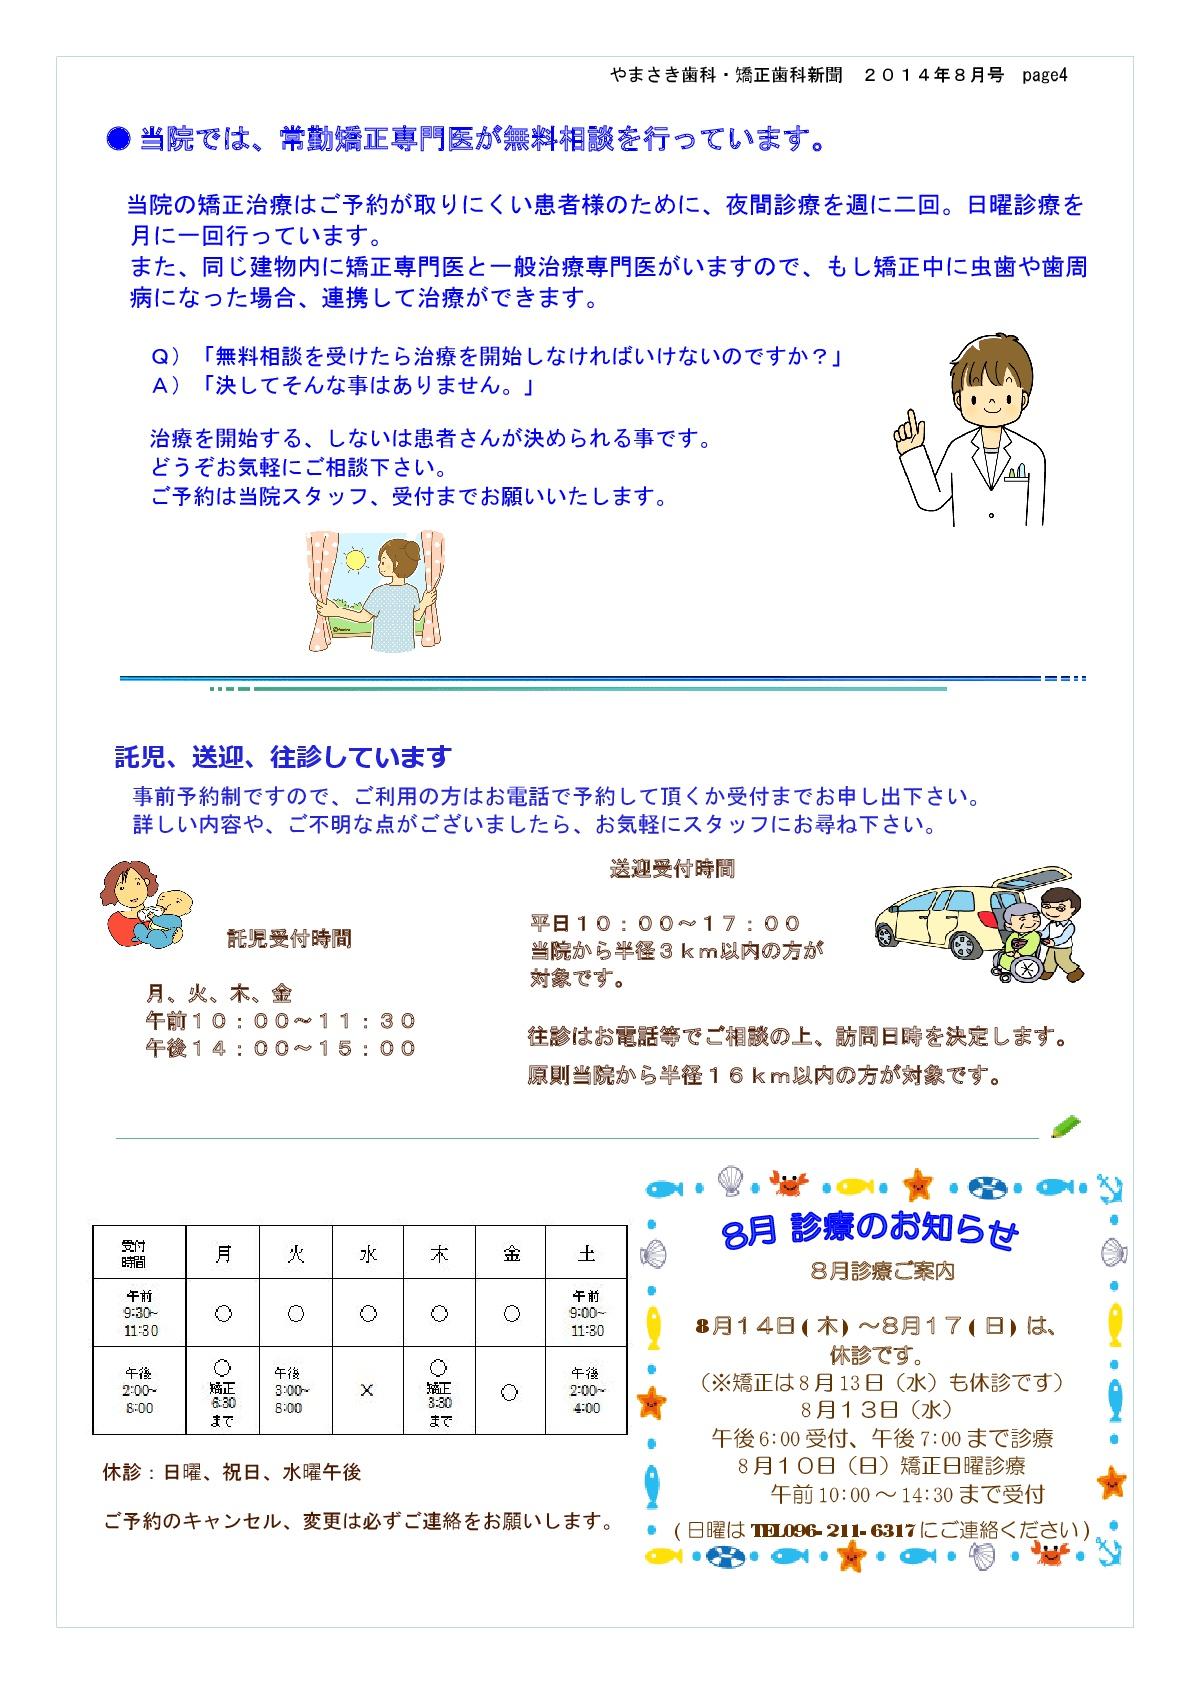 sinbun14-8-2-003